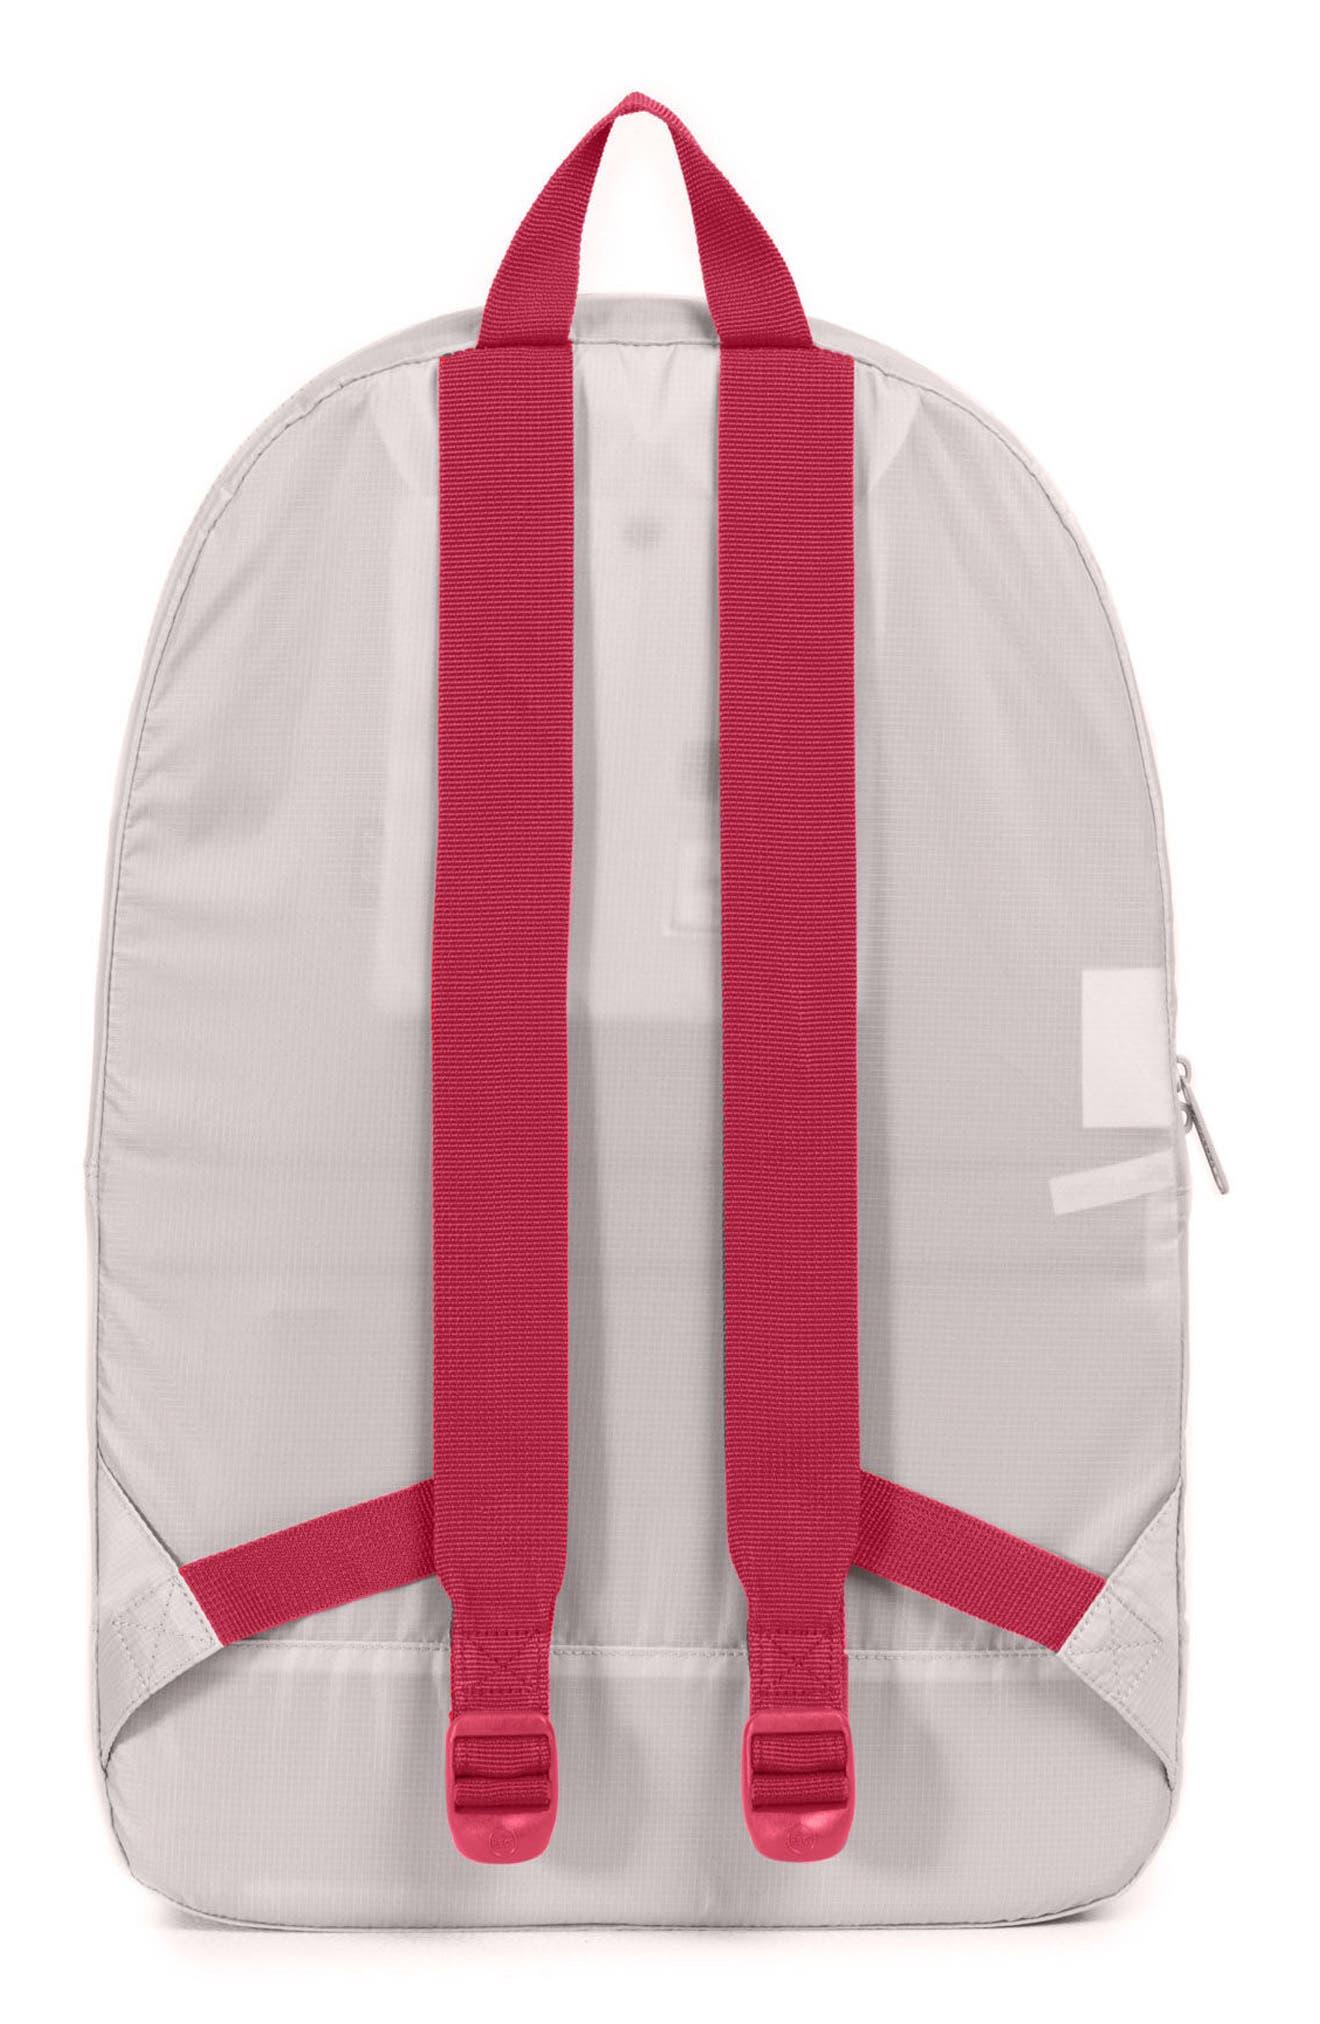 Packable - MLB National League Backpack,                             Alternate thumbnail 2, color,                             ST LOUIS CARDINALS